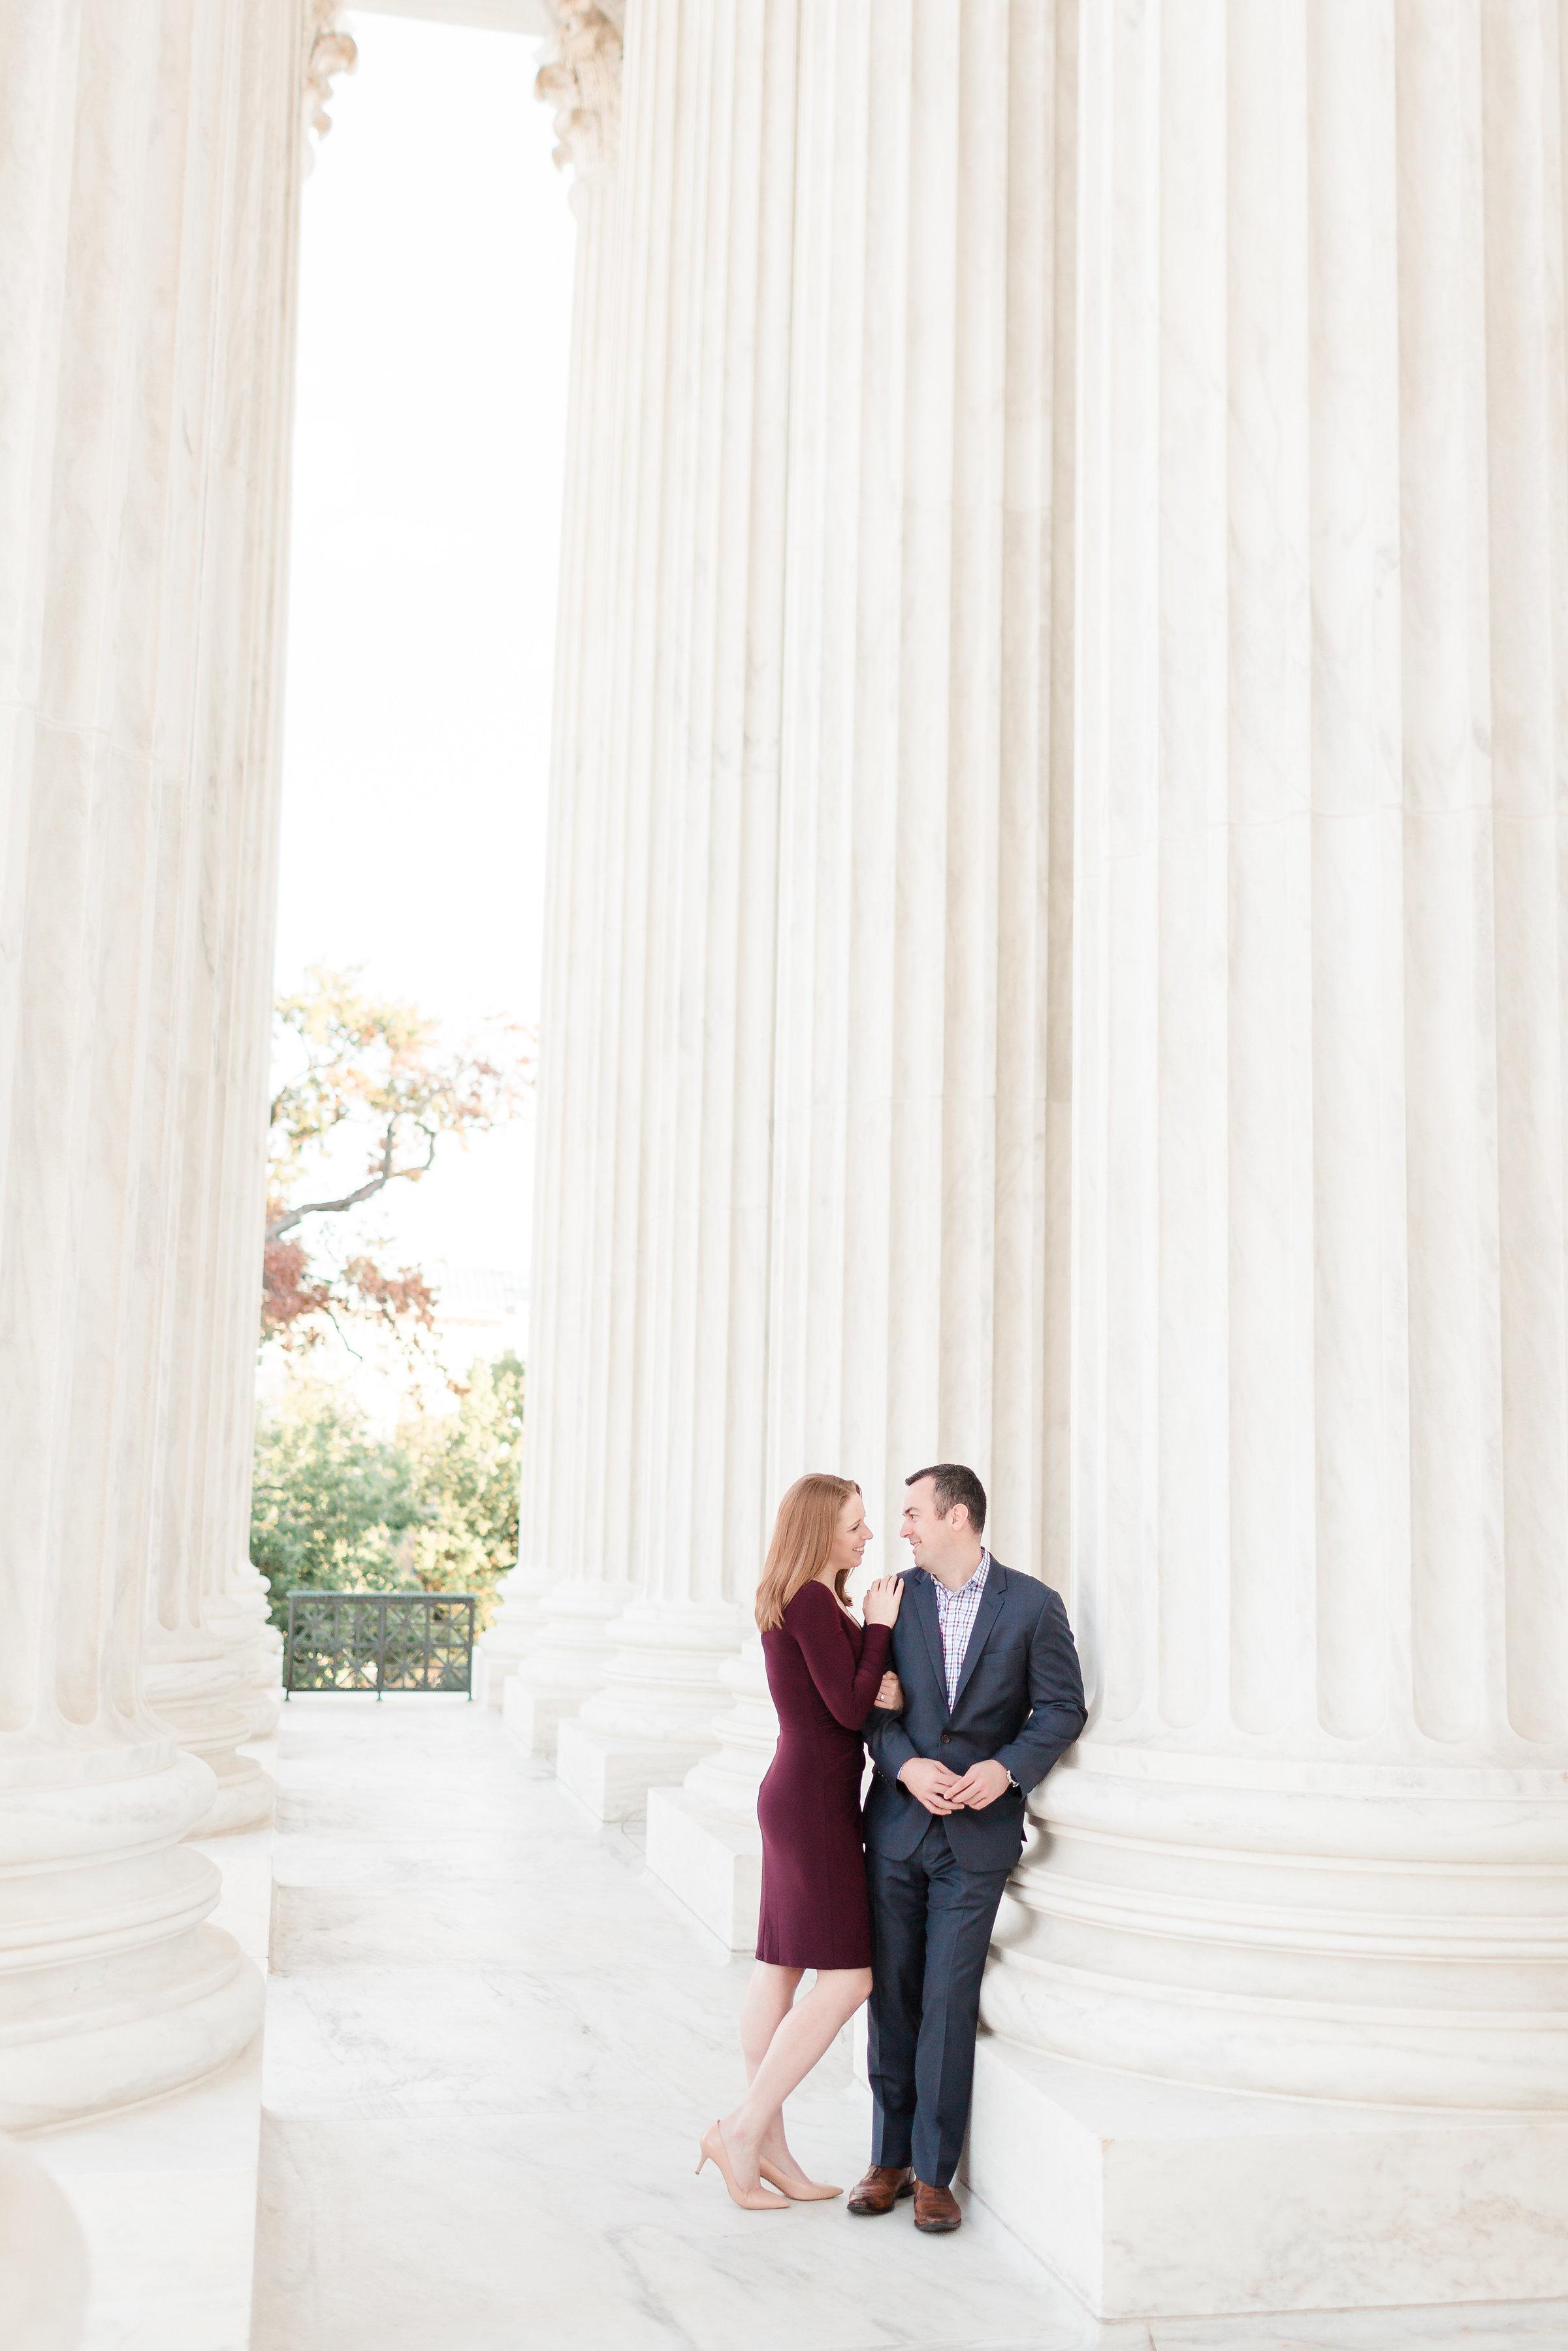 Washington DC Engagement Session Alicia Lacey Photography_M&B-86.jpg